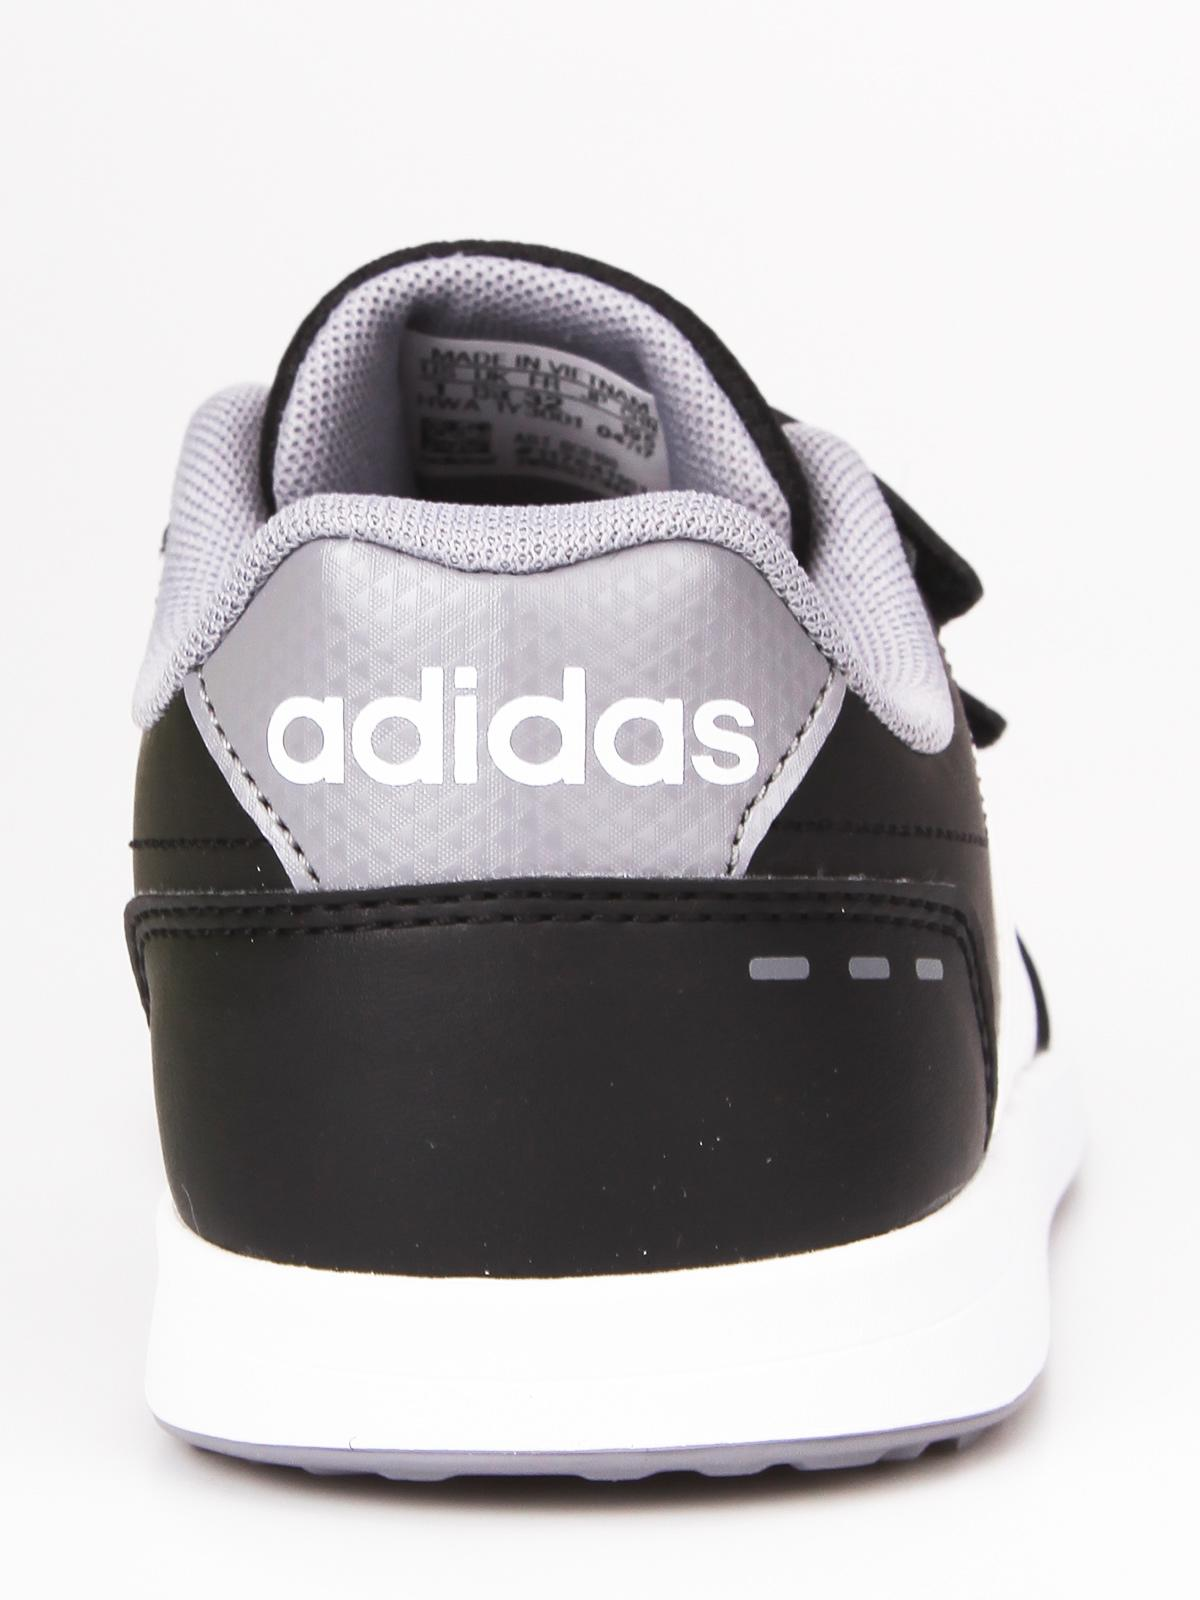 adidas donna scarpe da ginnastica no laces